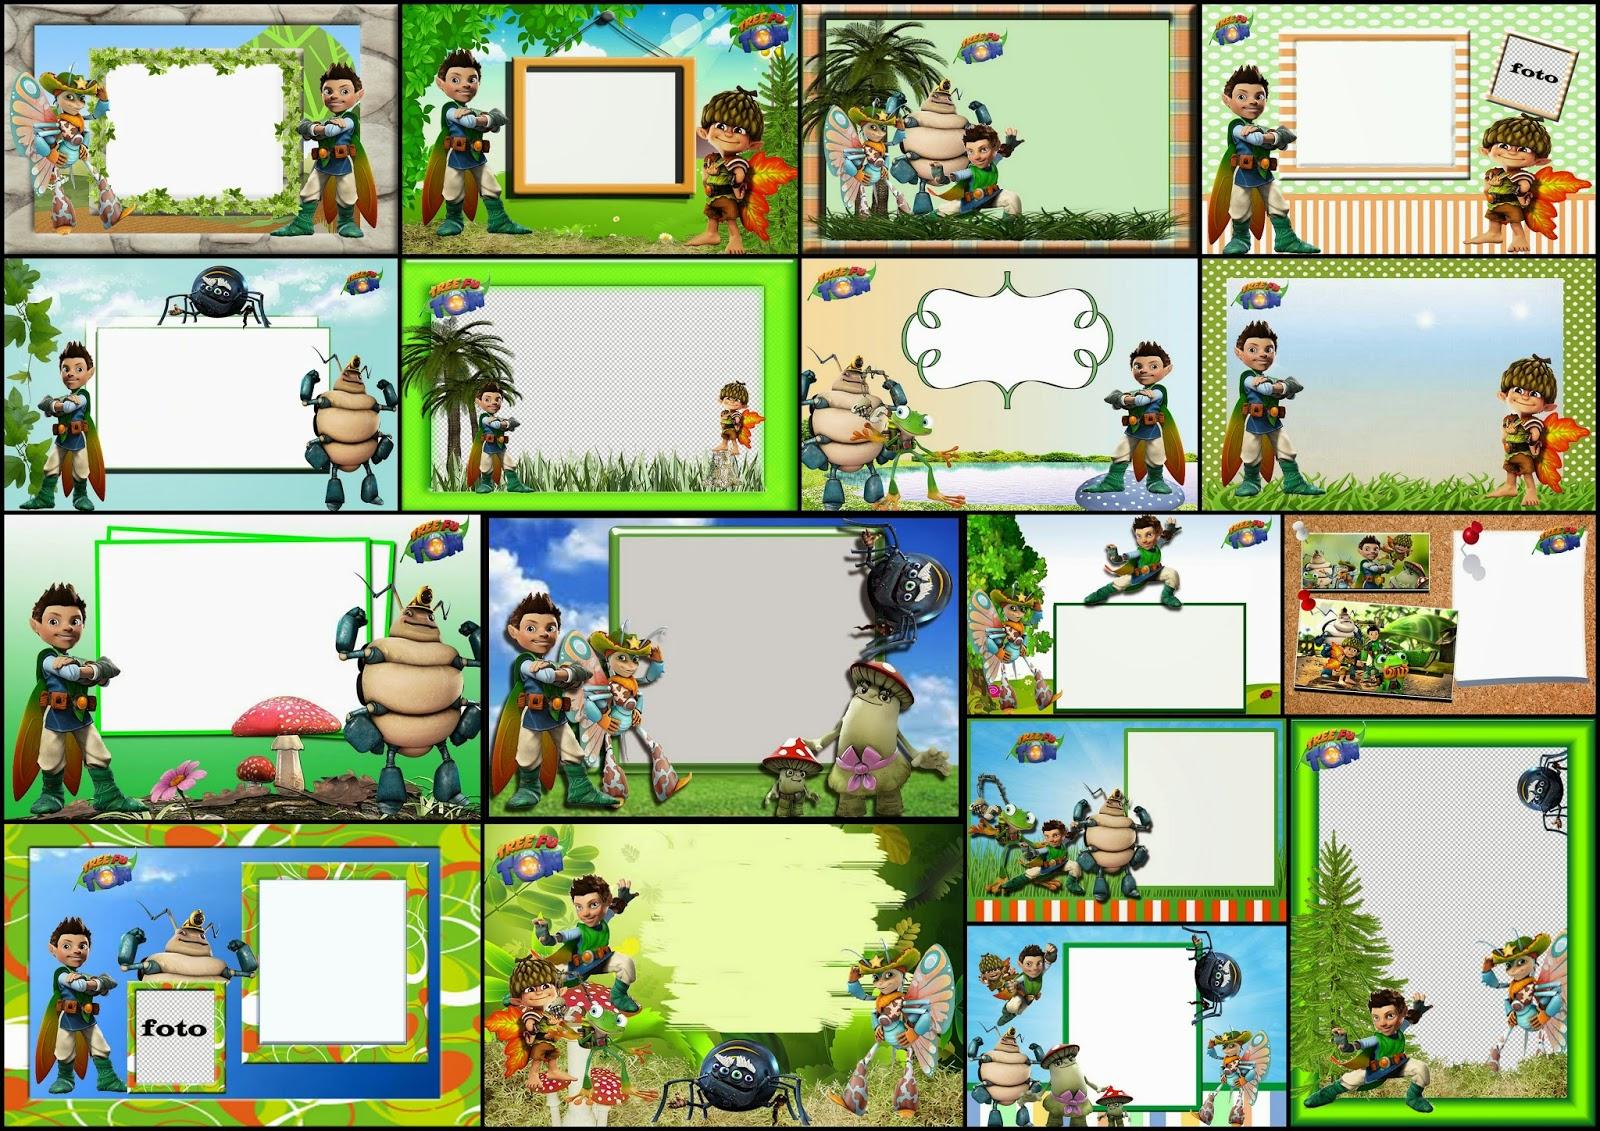 Tree Fu Tom Free Printable Invitations Cards Or Photo Frames Oh